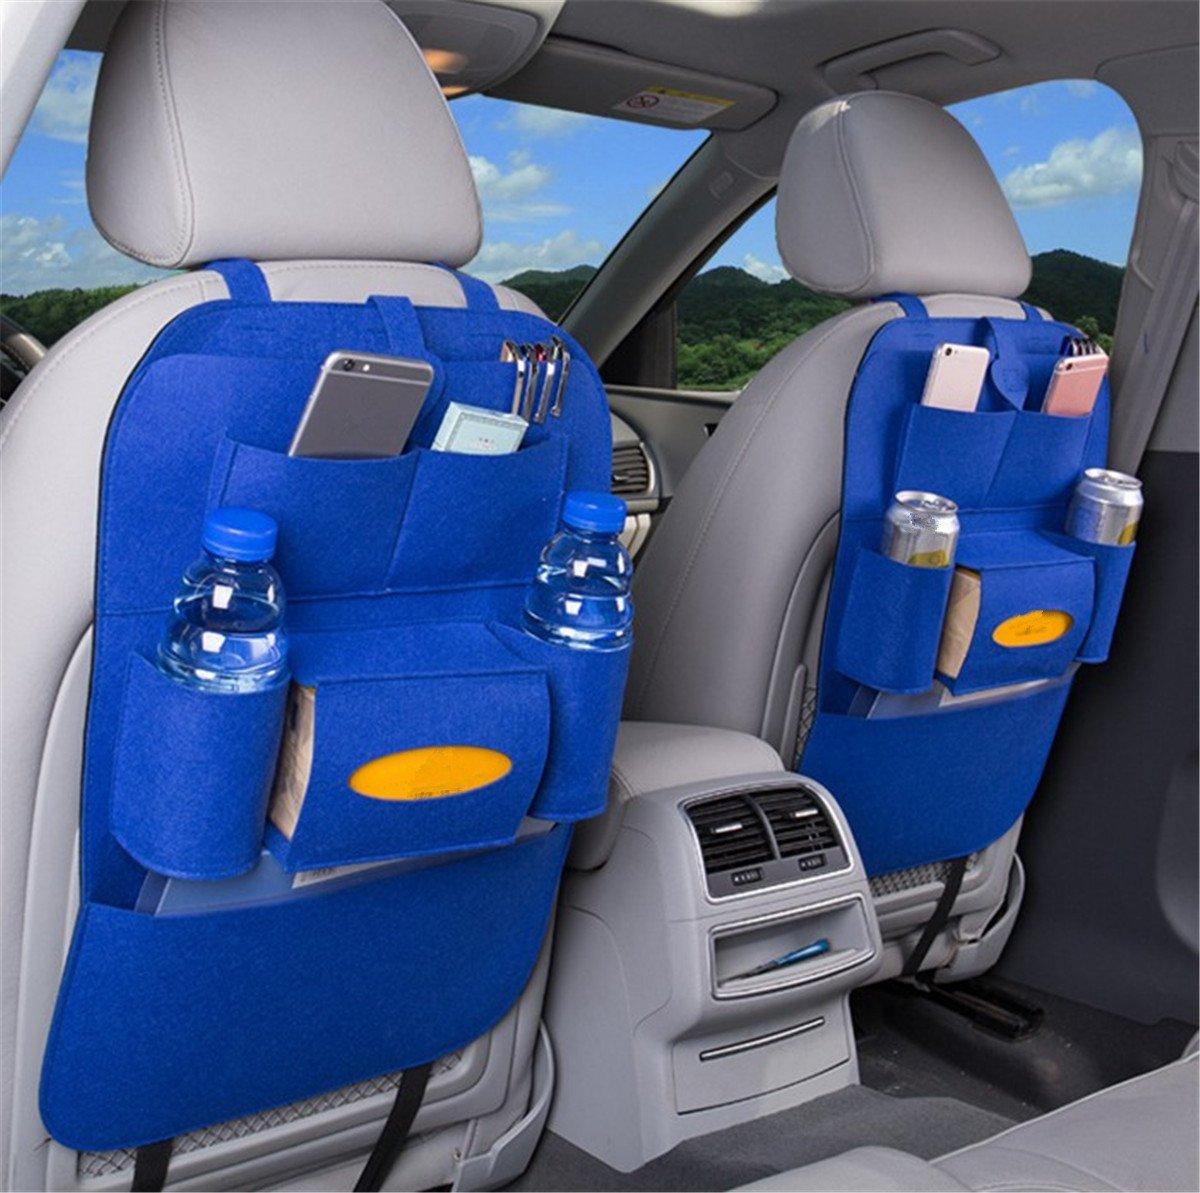 Pink BININBOX Car Backseat Organizer Felt Pocket Protector Kick Mat Auto for Baby Kids Travel Accessories Toy Bottle Storage